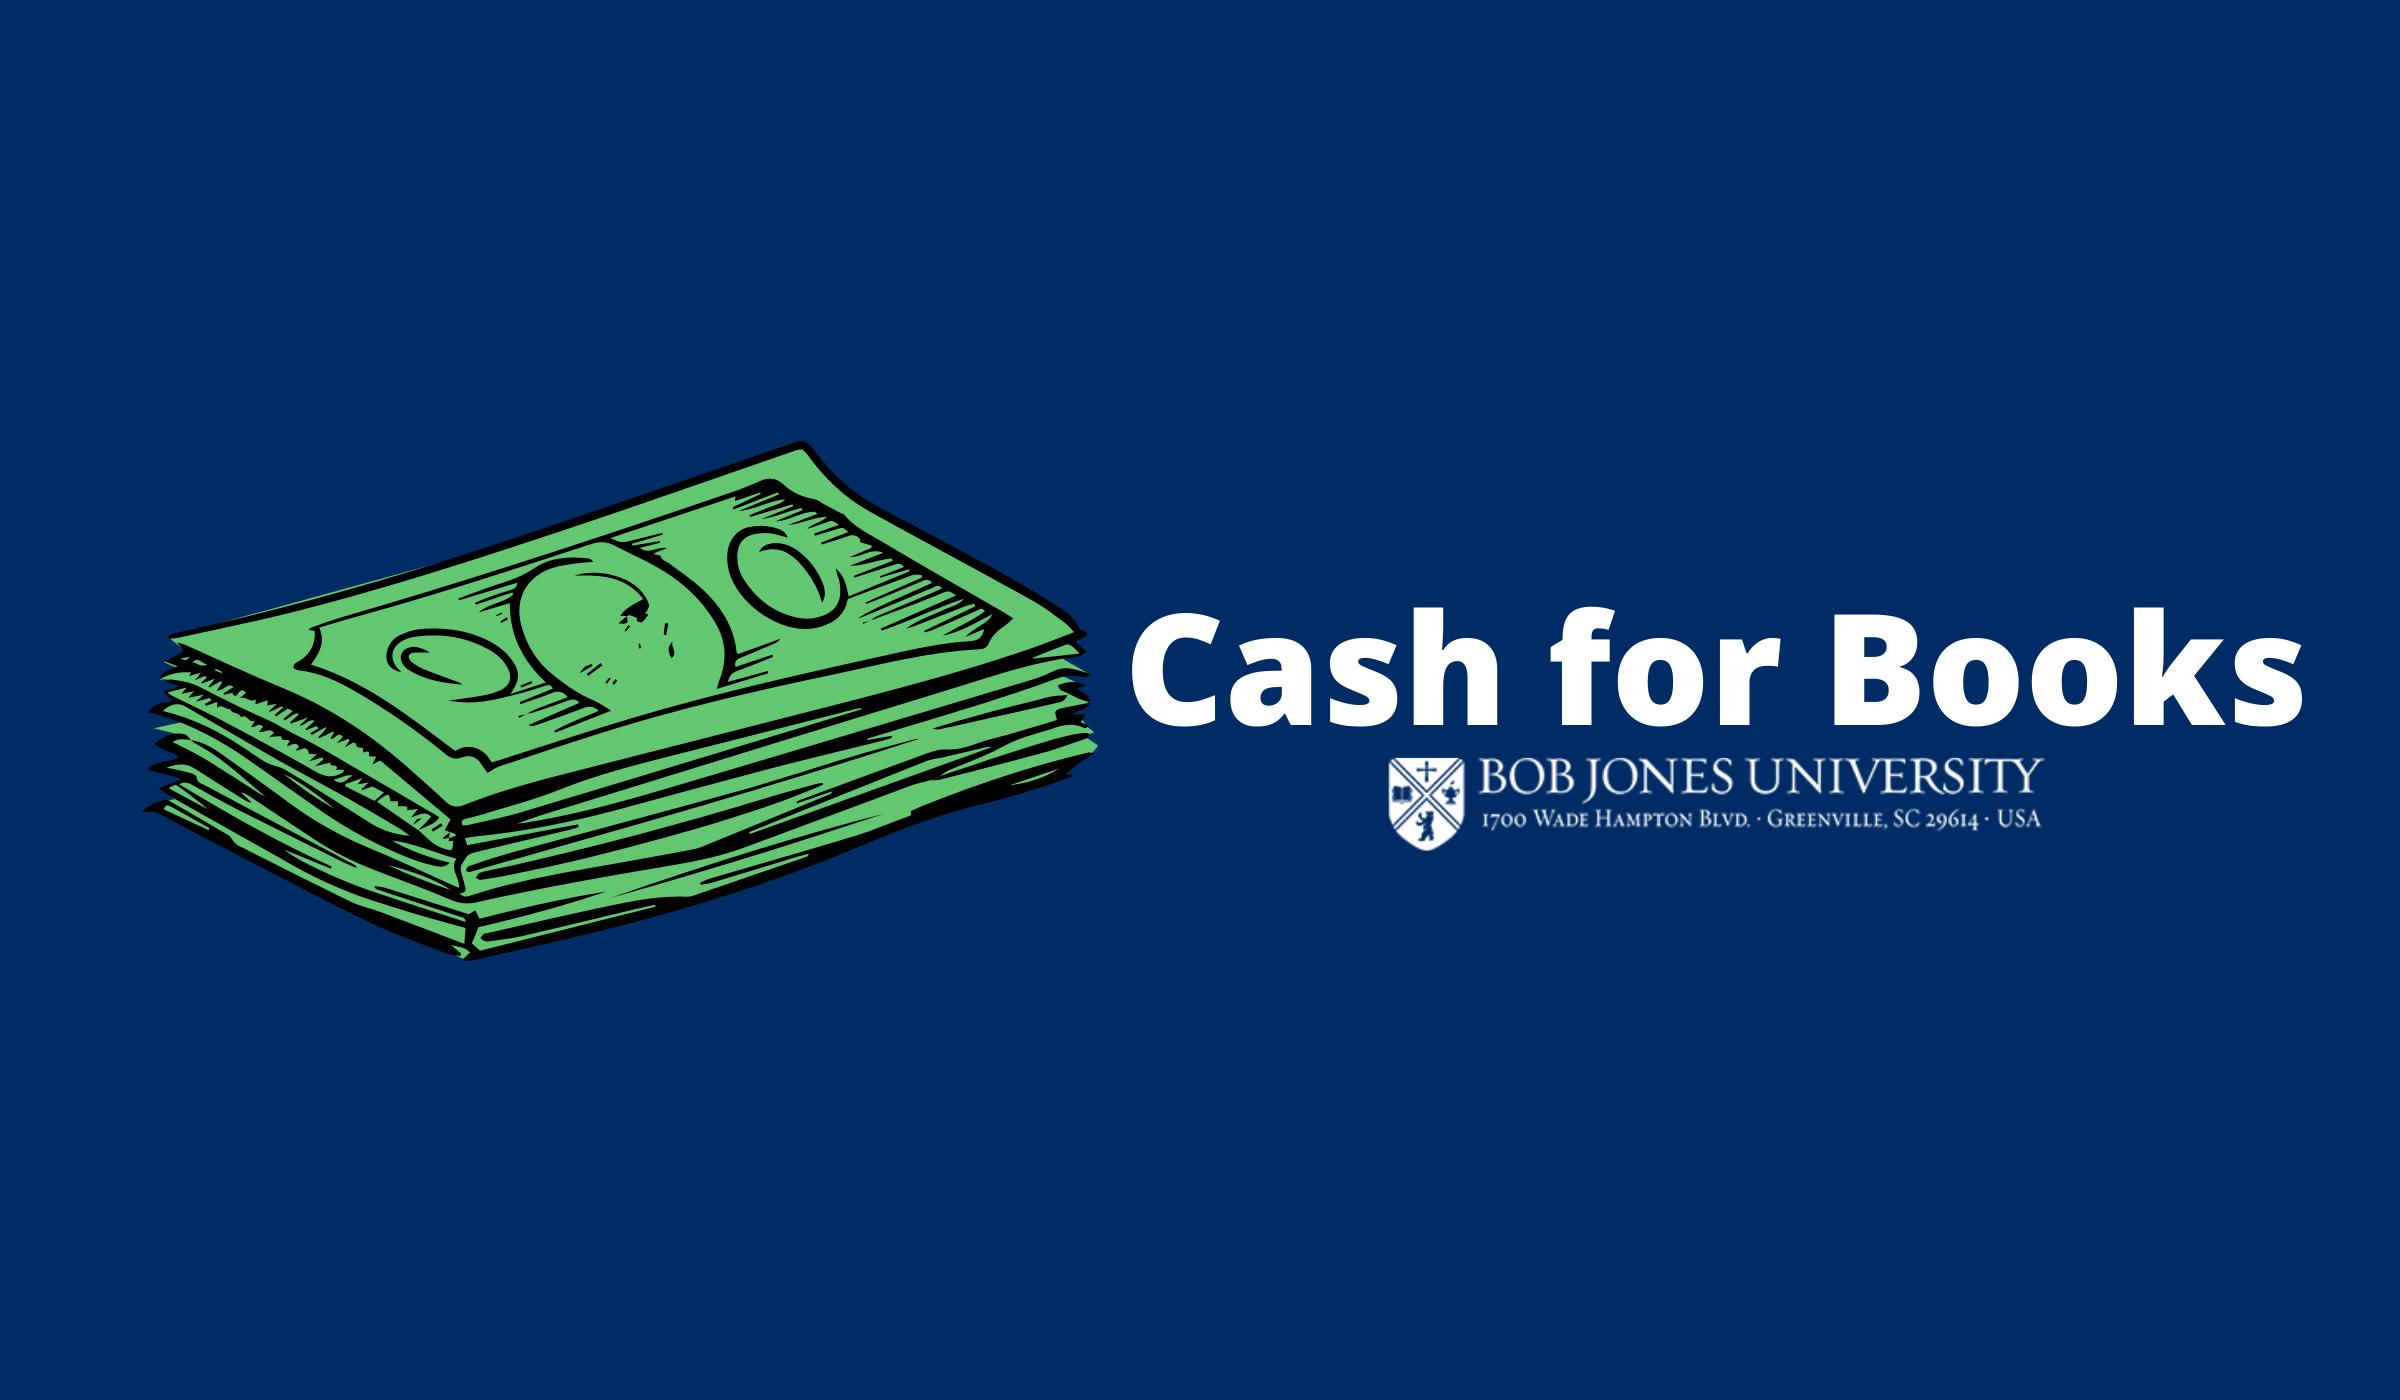 Cash for Books